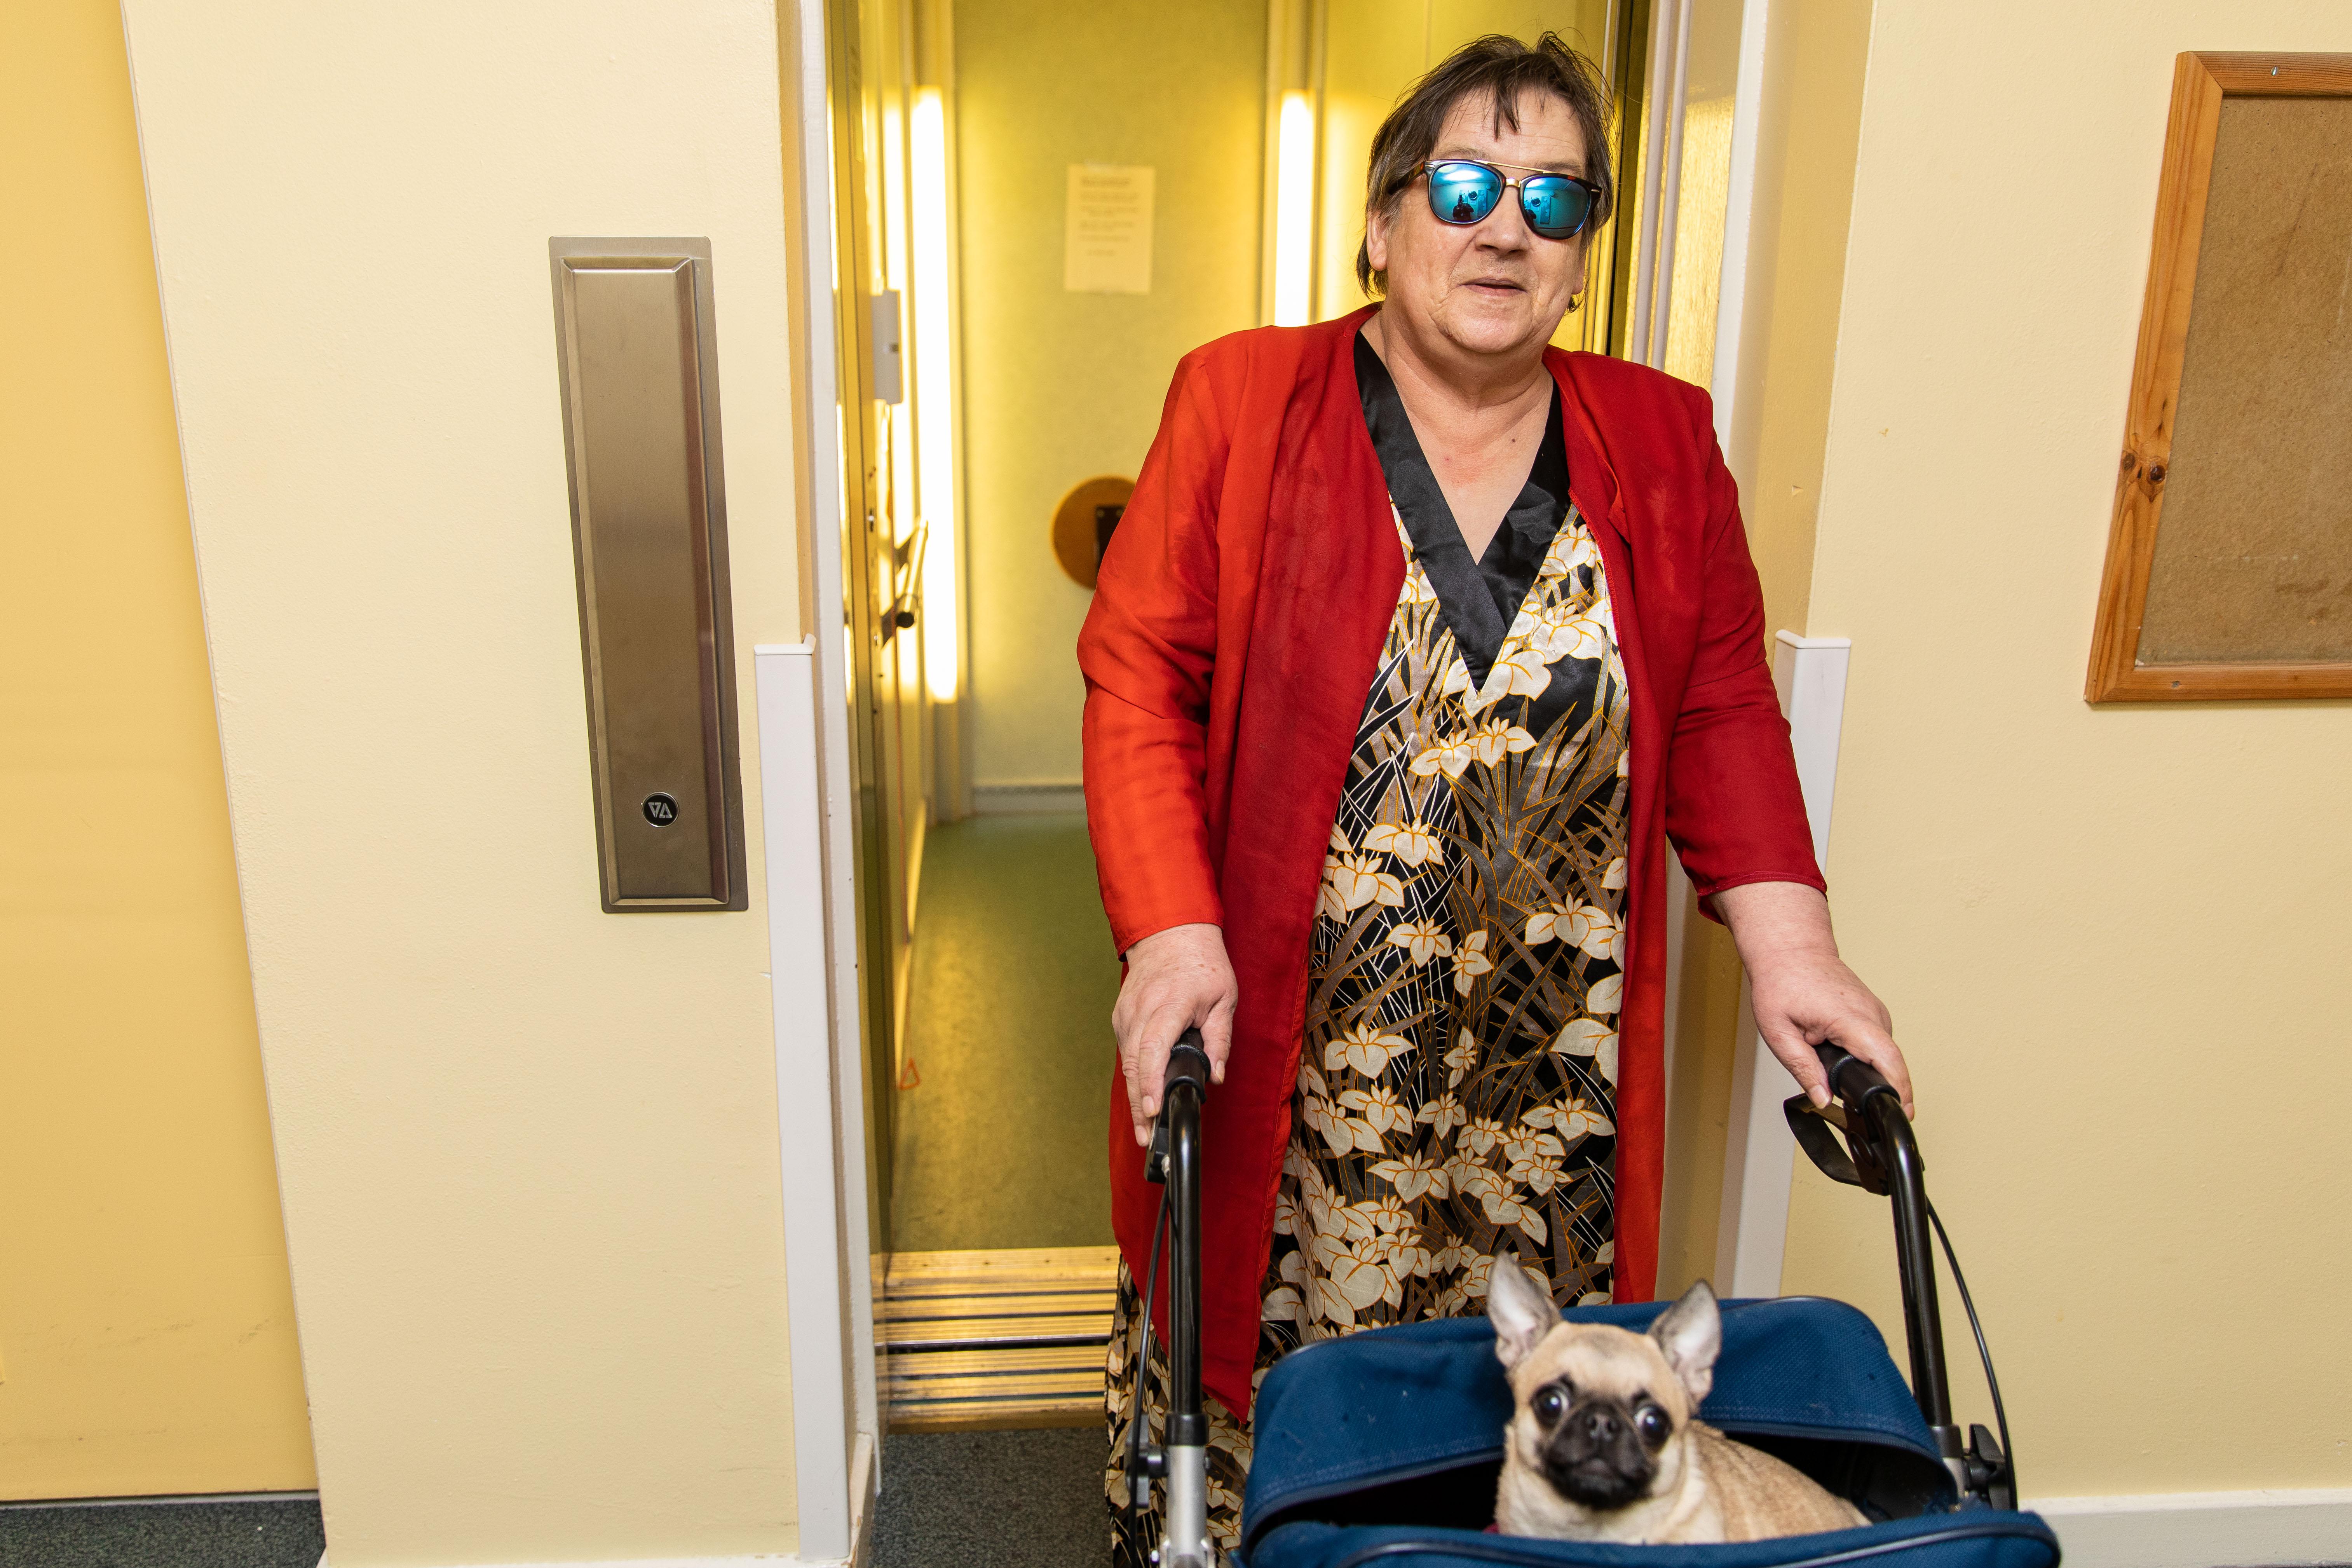 Jemima with pet dog Elsa